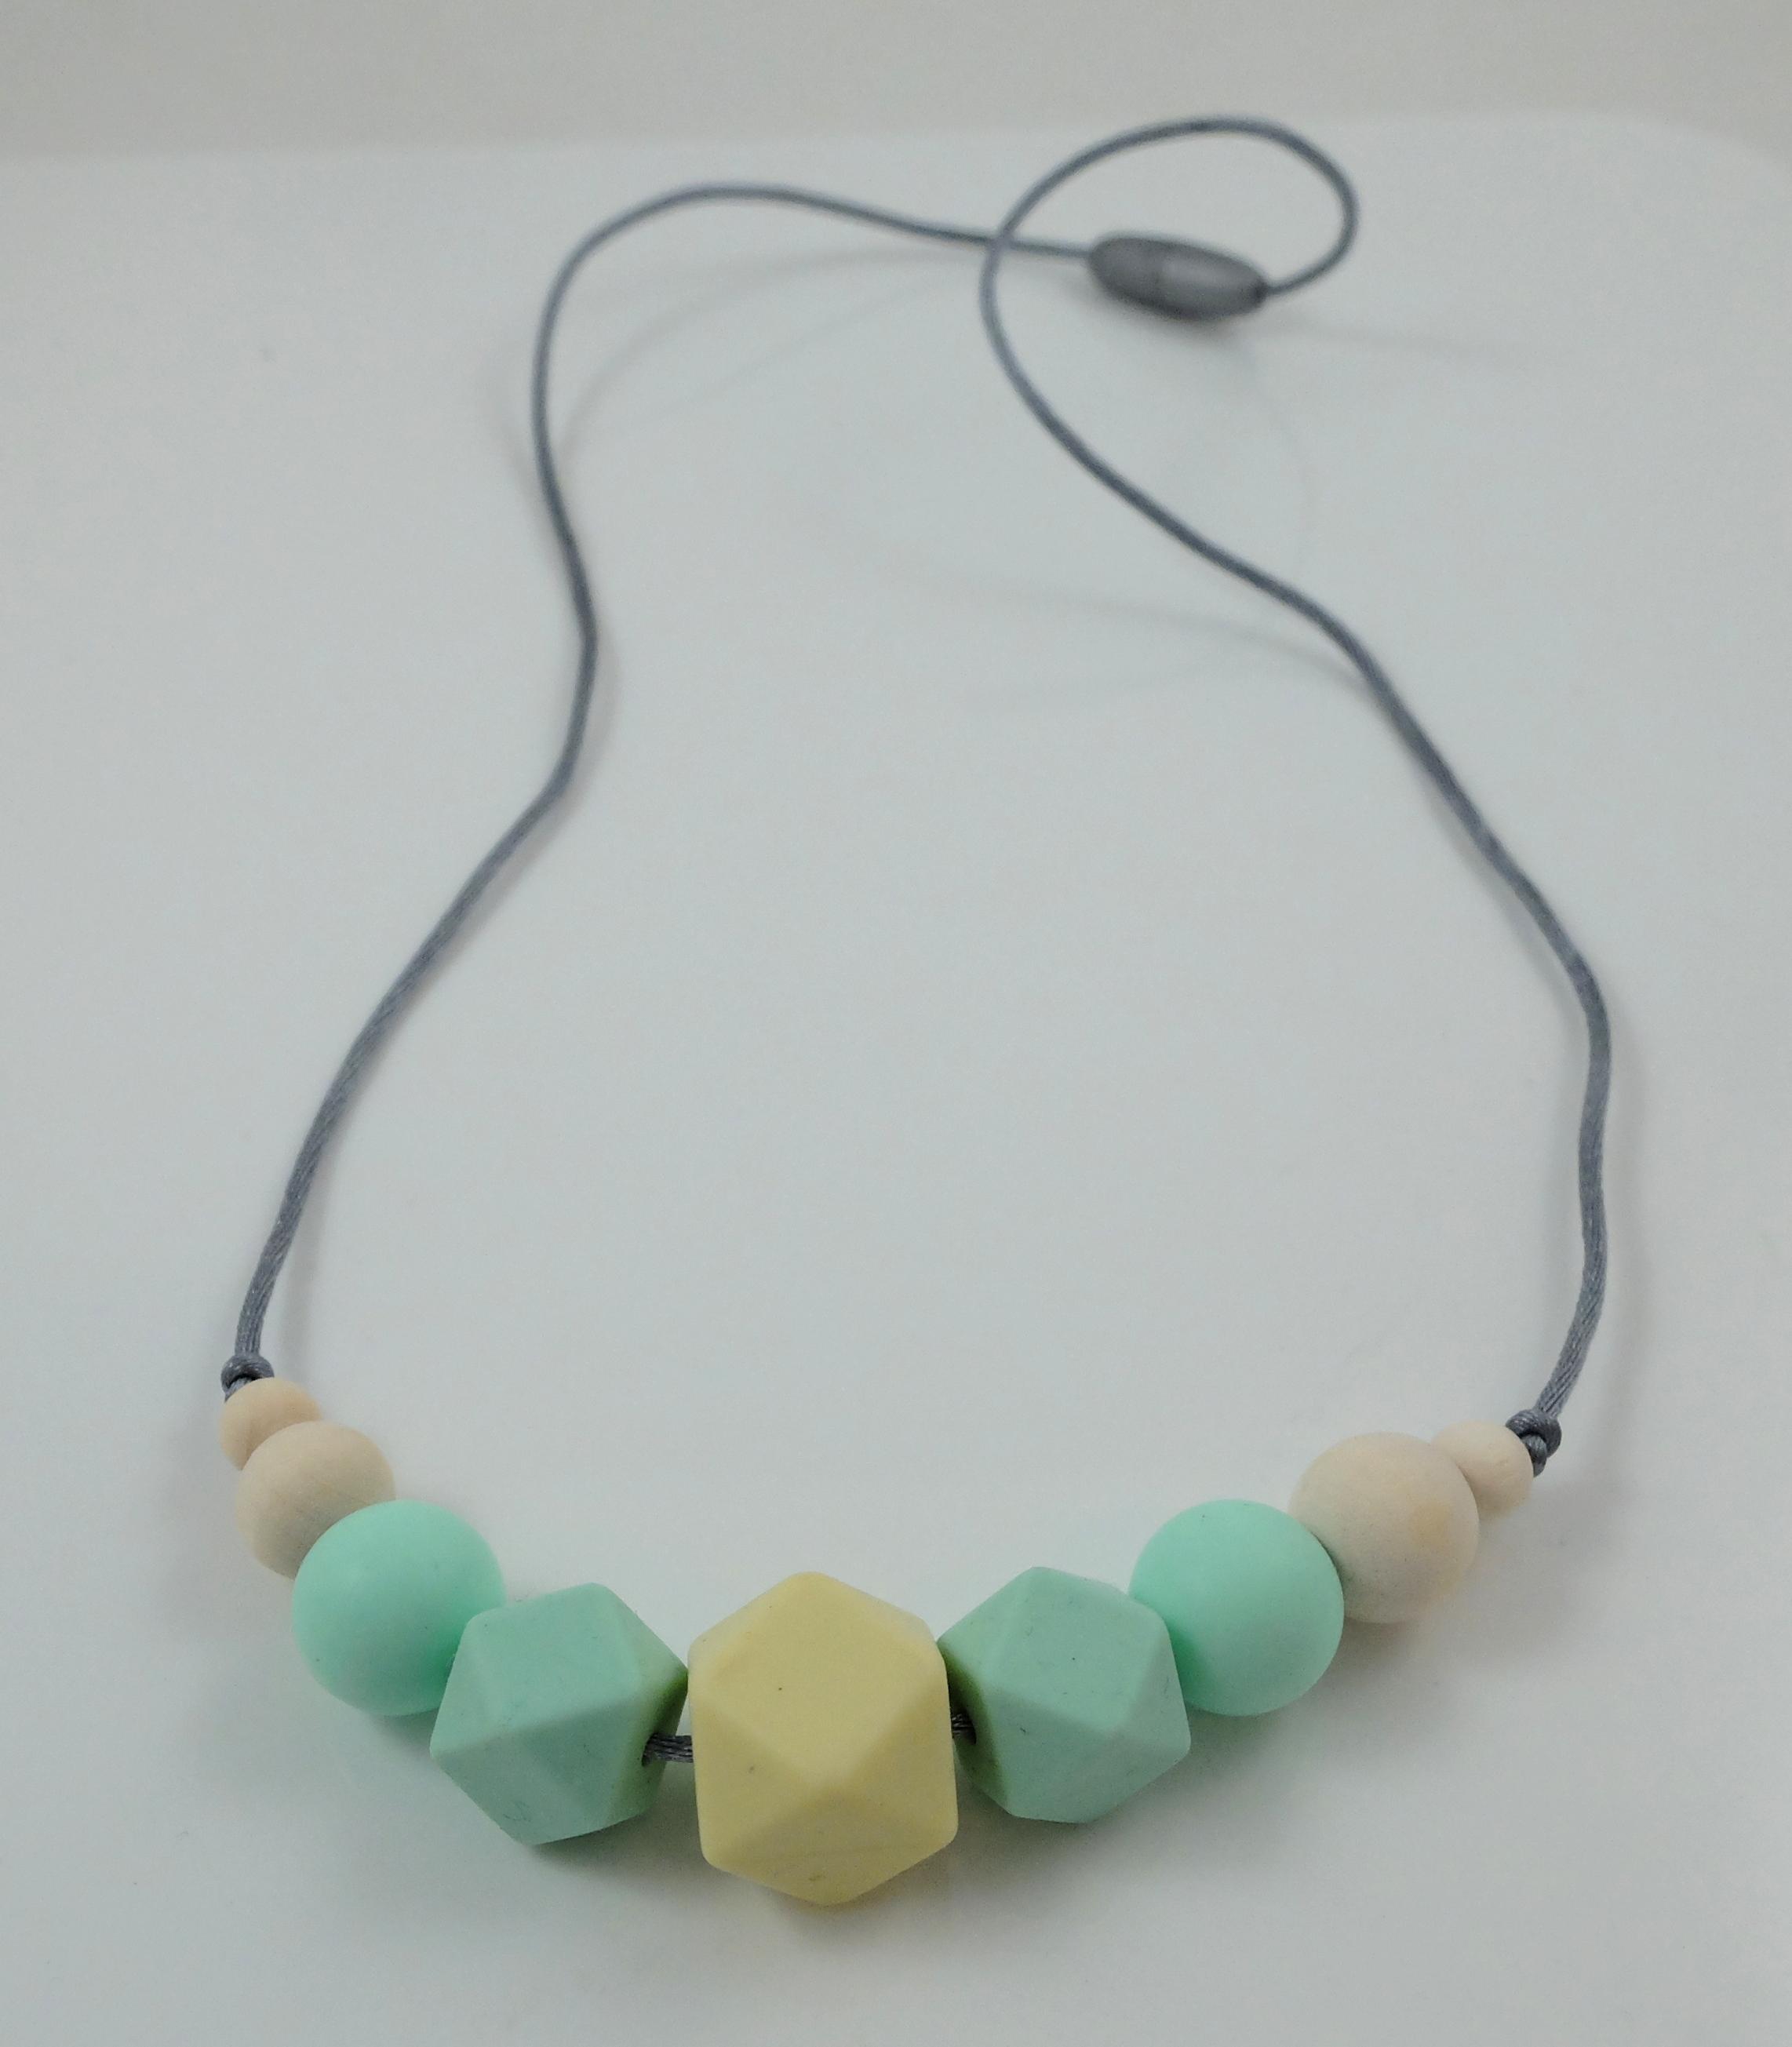 Hexagon & Round Beads Nursing Necklace